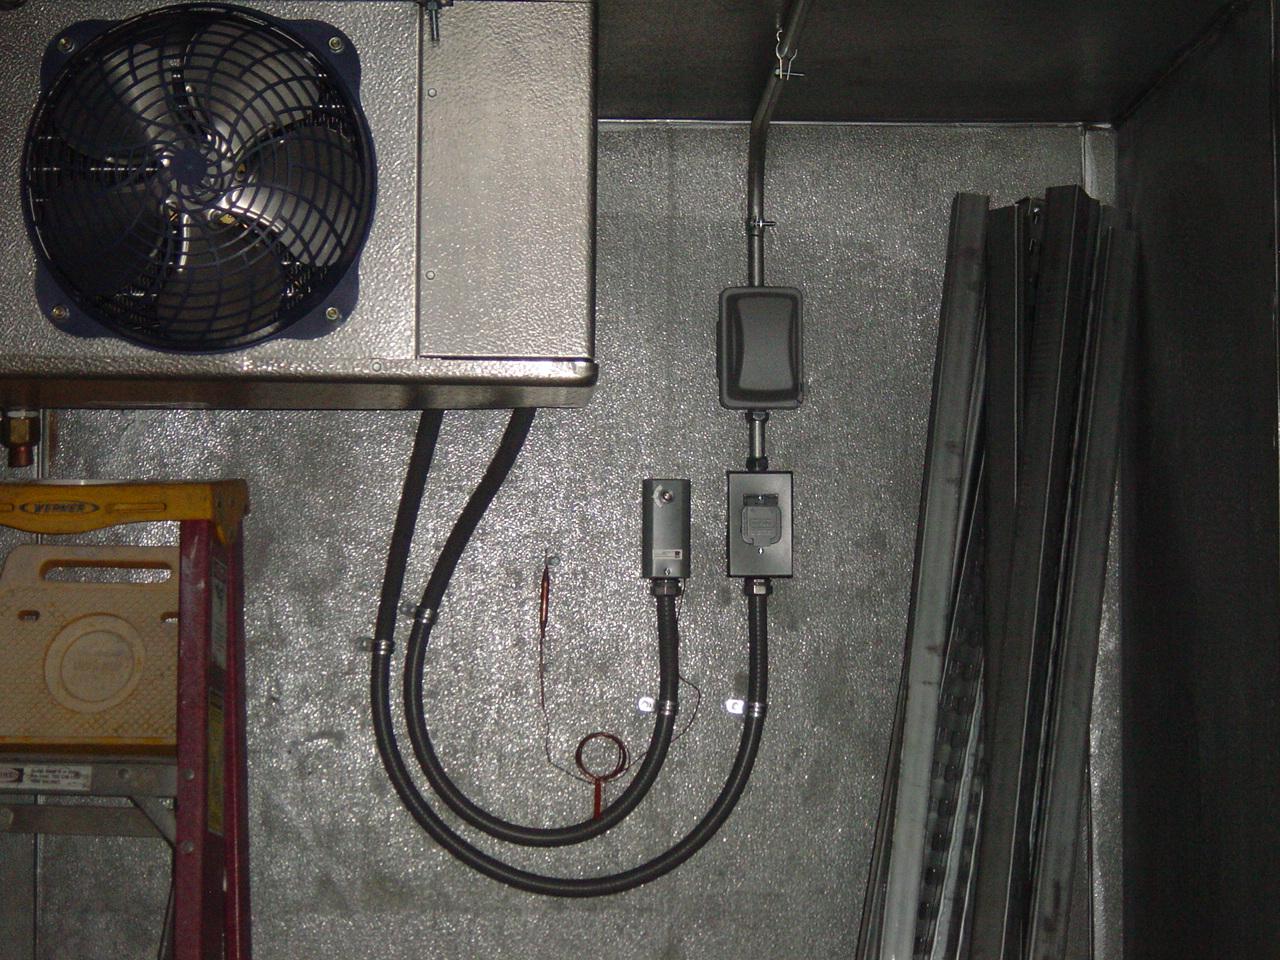 Of Walk In Freezer Wiring Diagram Wire Diagram Images Walk In Freezer